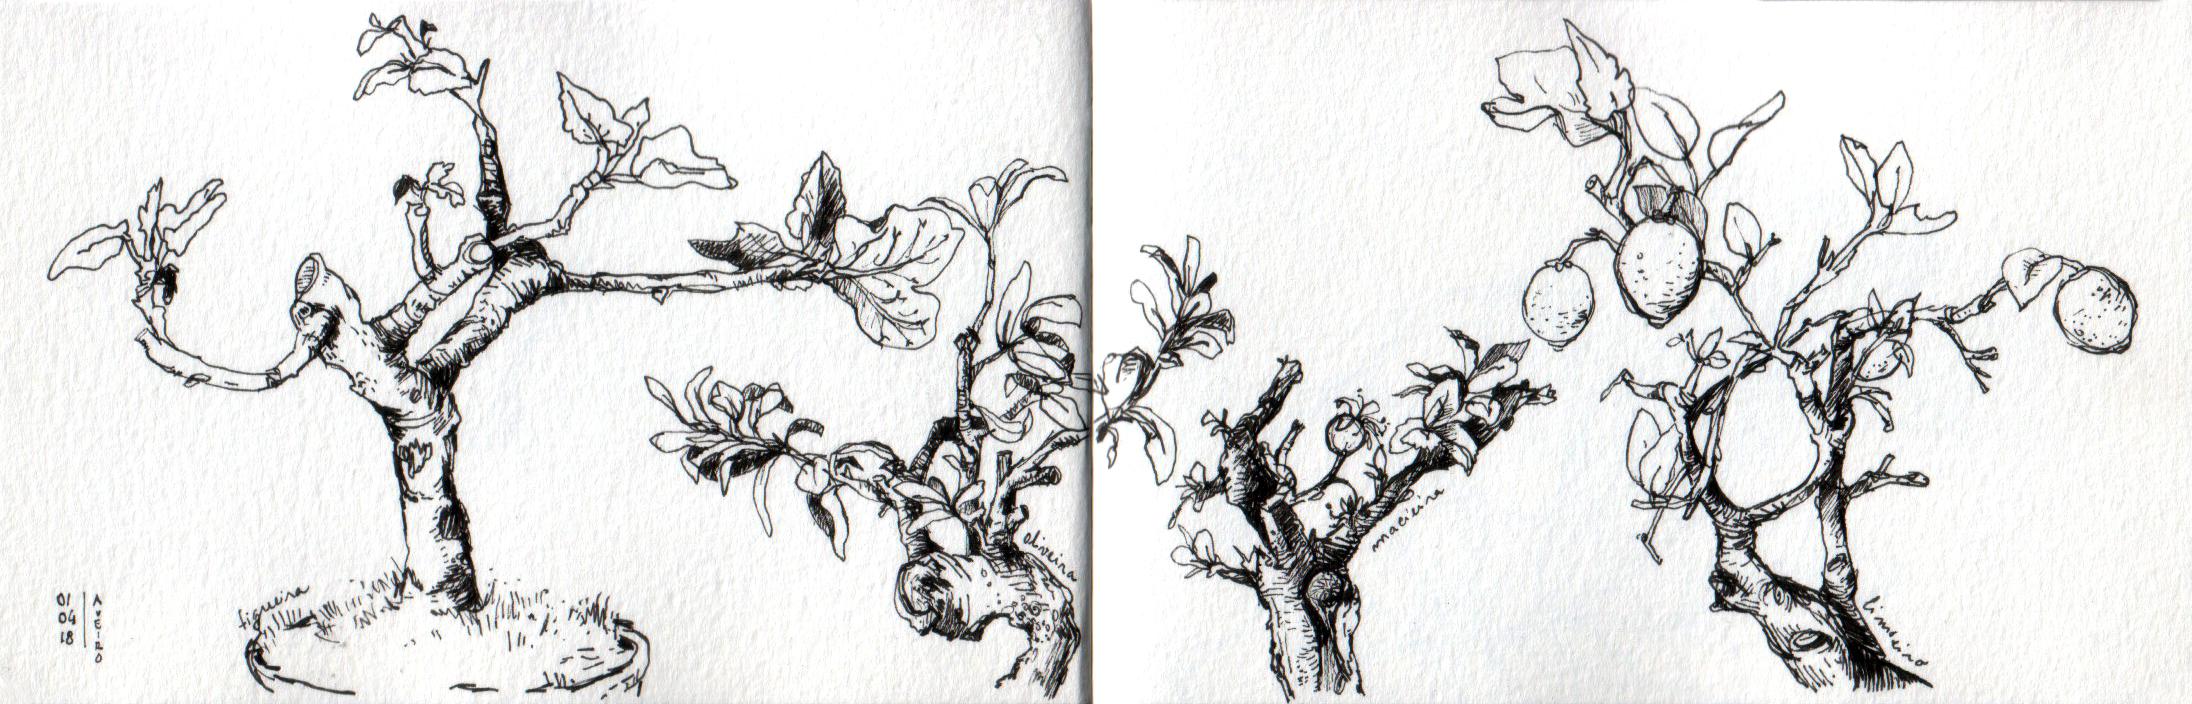 ana romao - drawing of four bonsai trees made at aveiro